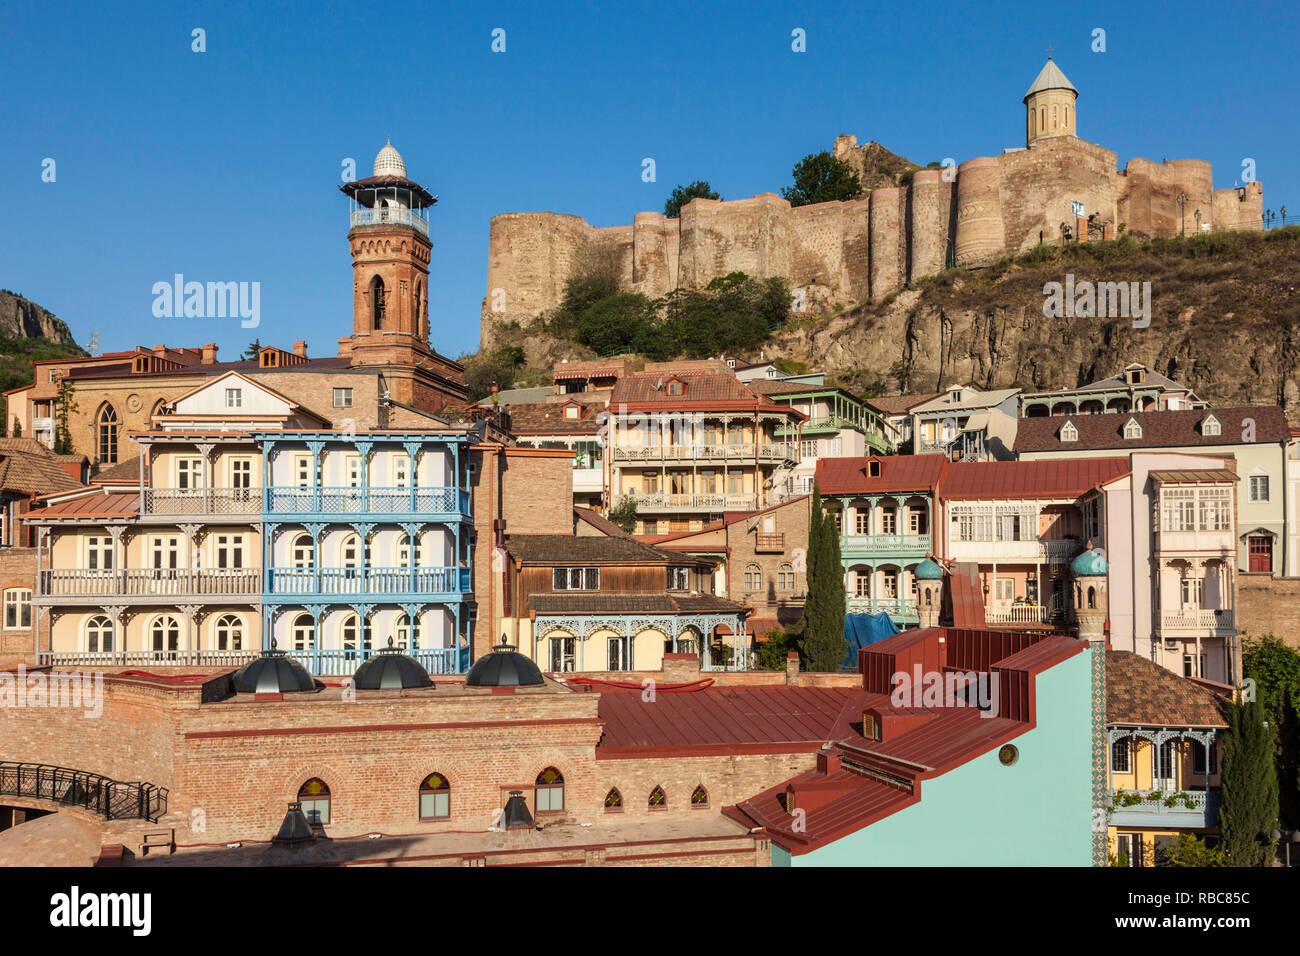 Georgia, Tbilisi, Old Town, Muslim Quarter, Tbilisi Mosque and Narikala Fortress Stock Photo